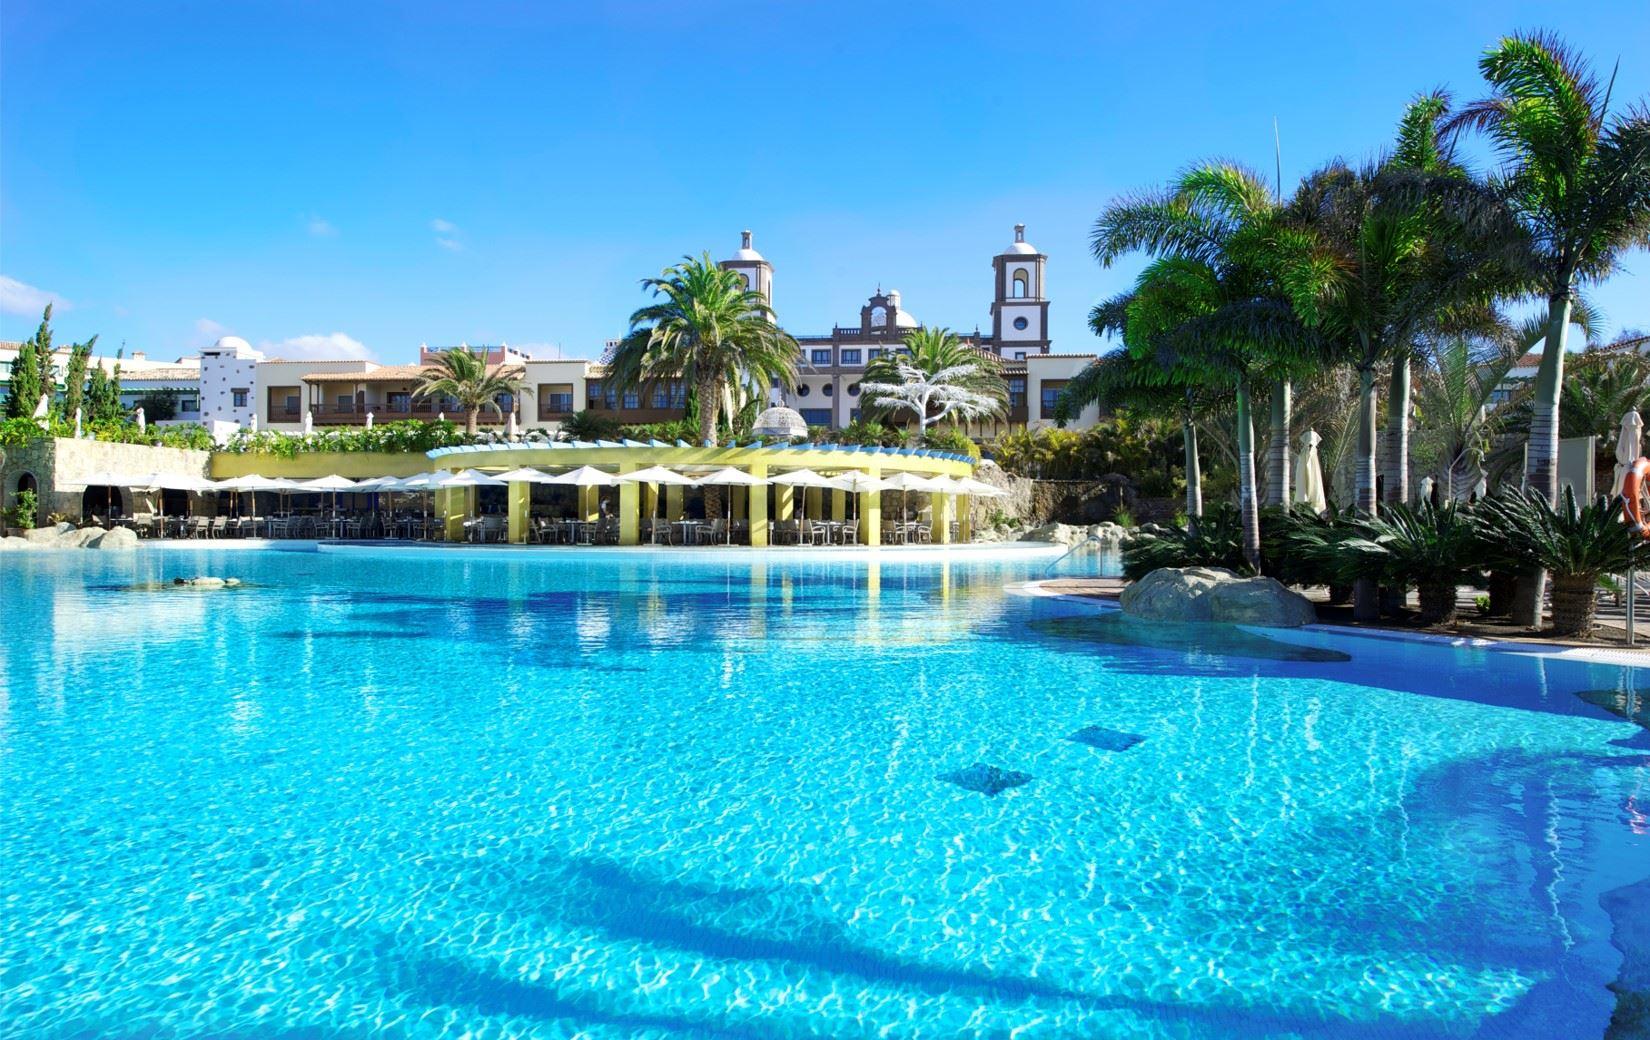 Pool Hotell Lopesan Villa del Conde Resort & Corallium Thalasso, Meloneras Gran Canaria